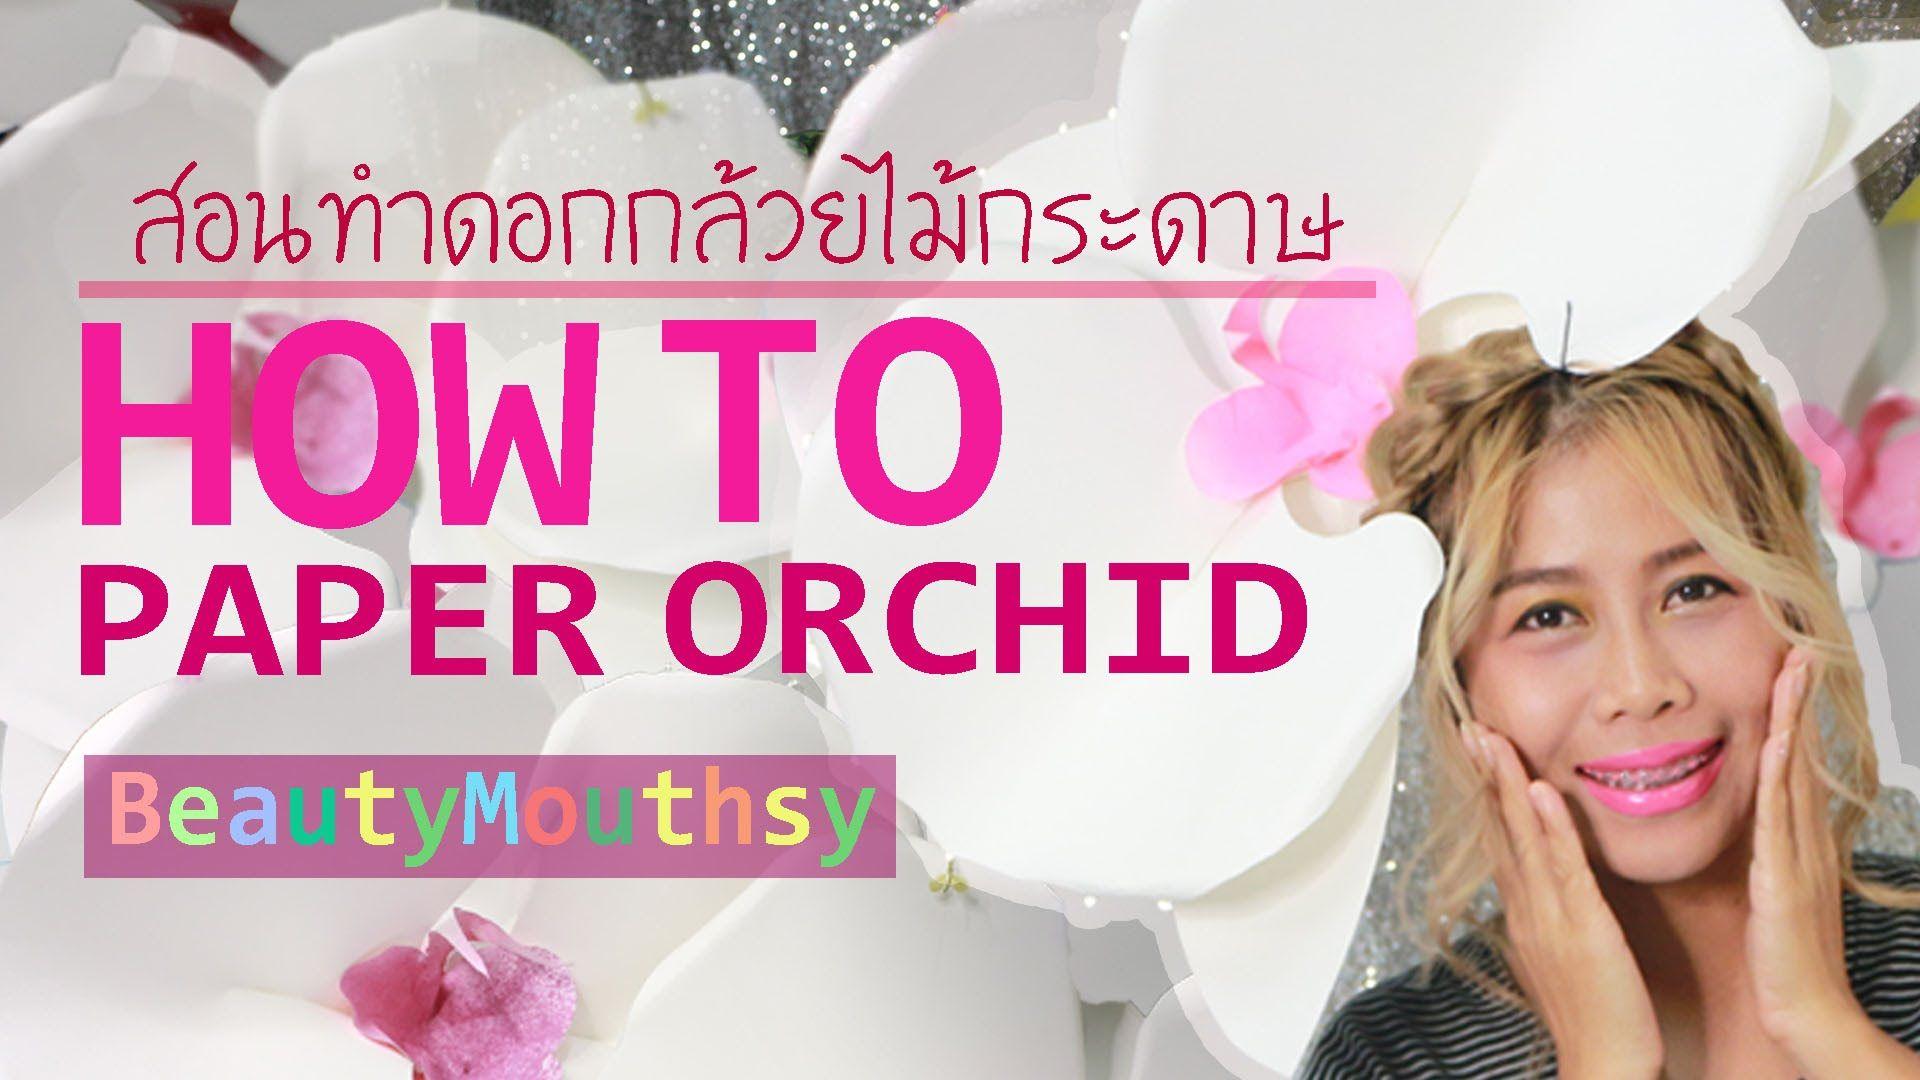 How to Make Giant Paper Orchid - มาดามเม้าท์สอนทำดอกกล้วยไม้ (ขนาดใหญ่)